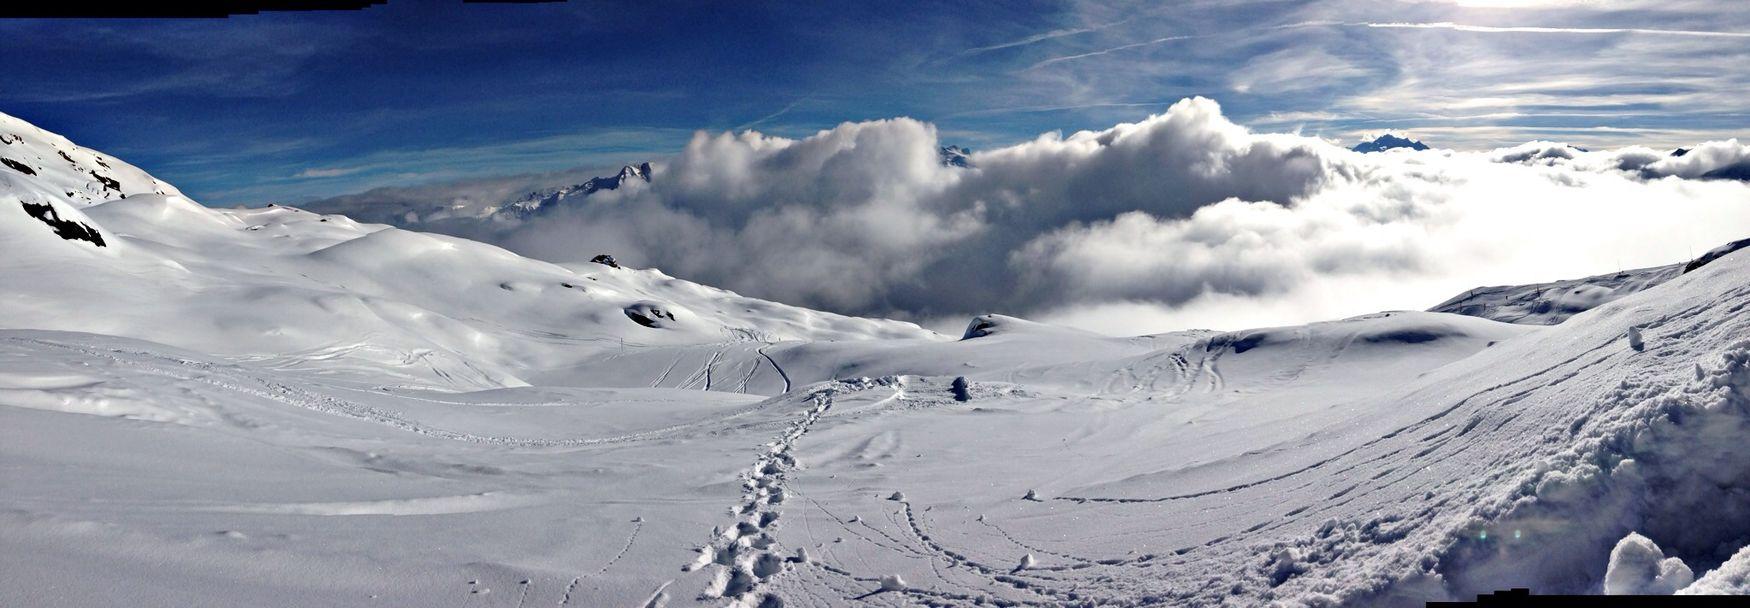 Mountains Snowboarding Nature Freeride